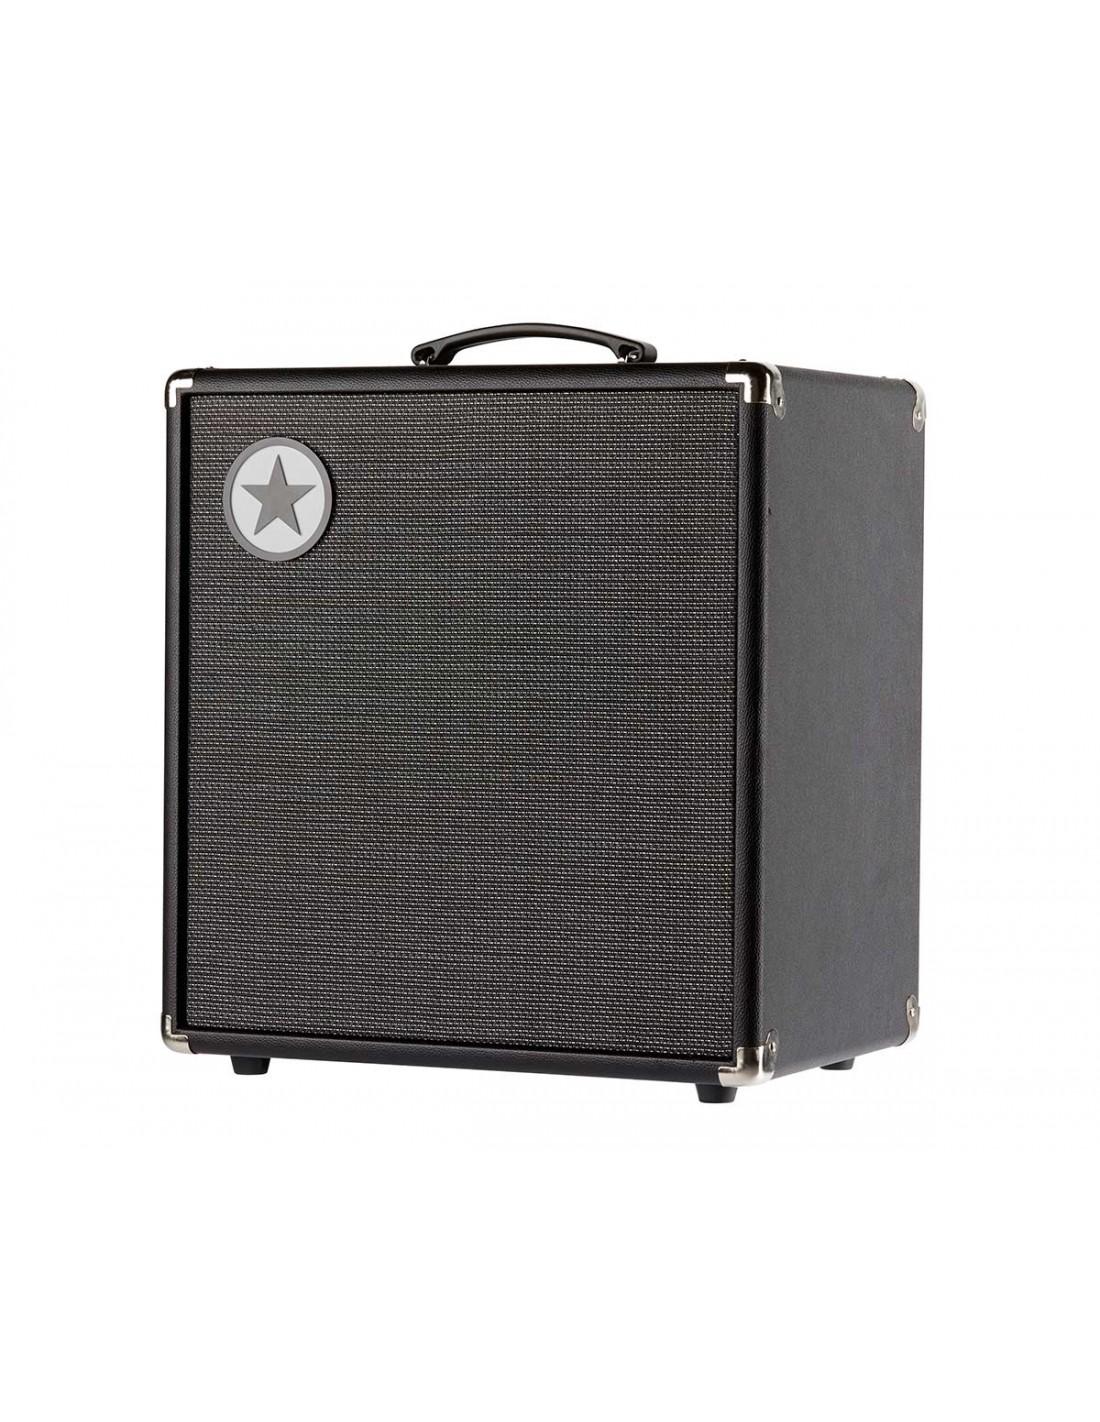 blackstar unity 120 bass amplifier. Black Bedroom Furniture Sets. Home Design Ideas